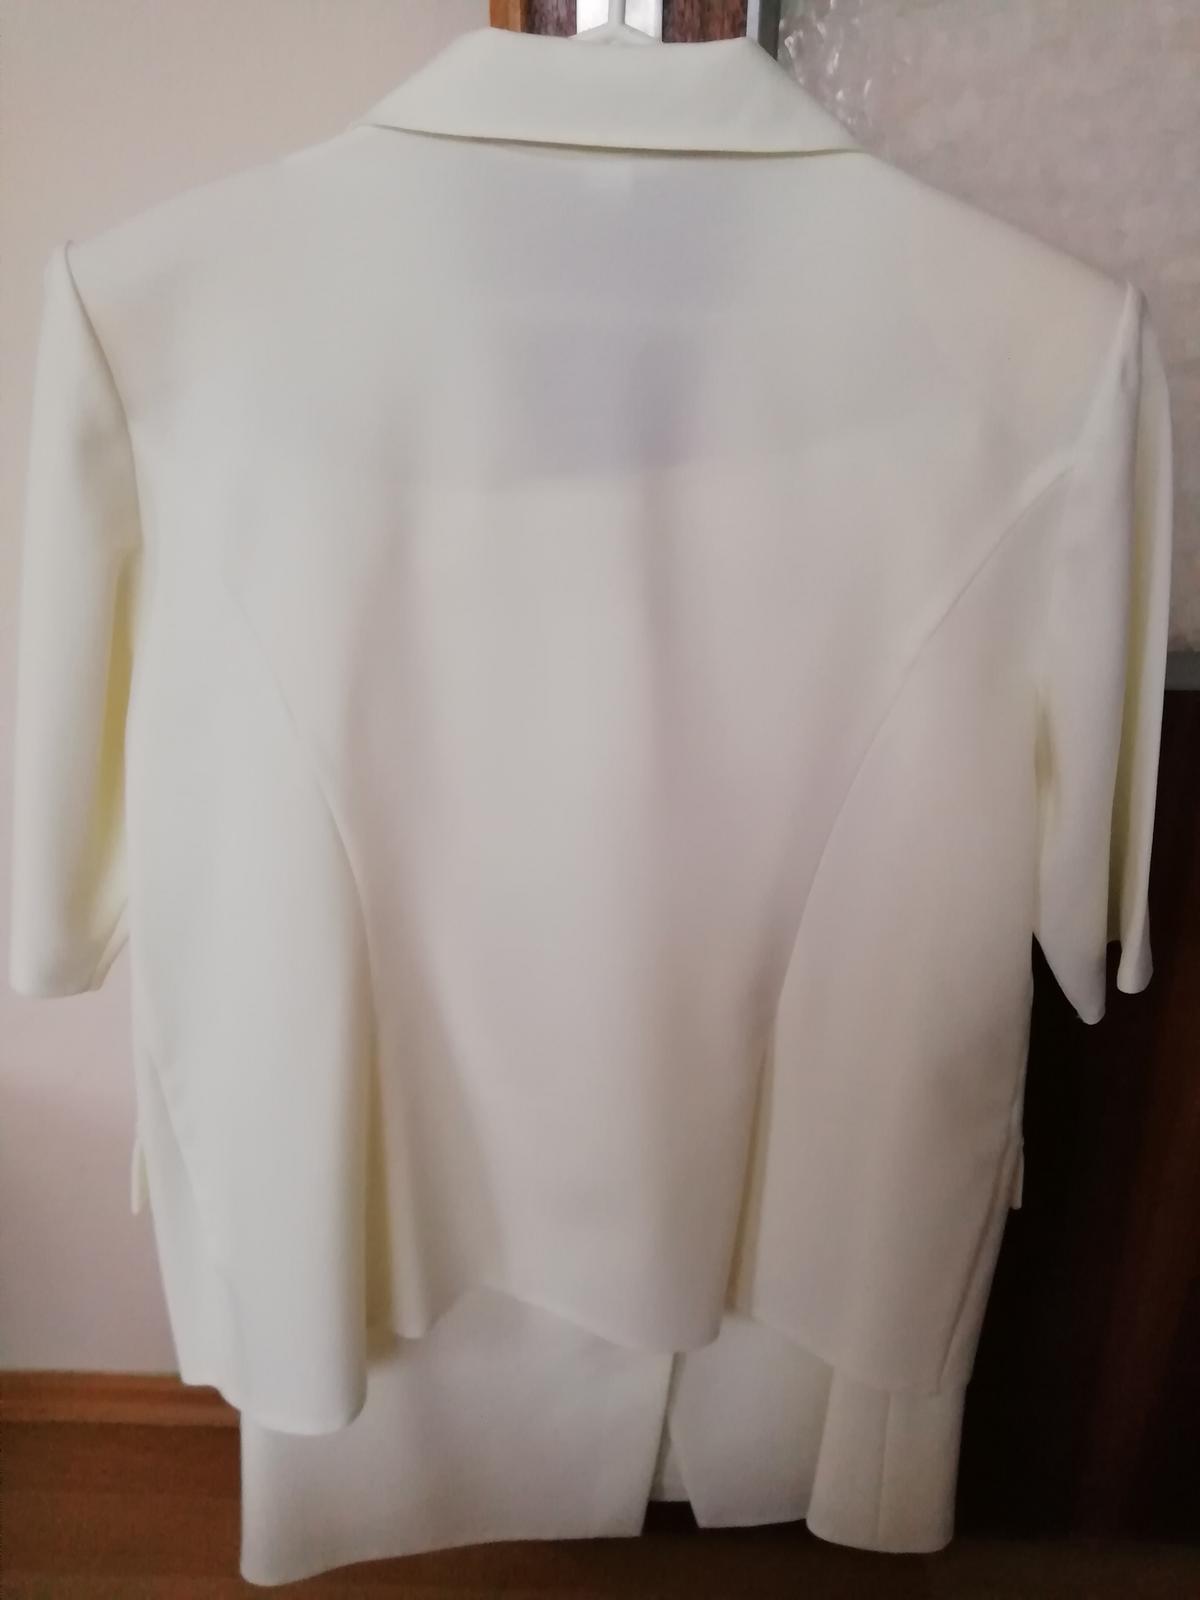 Maslový kostým - Obrázok č. 2